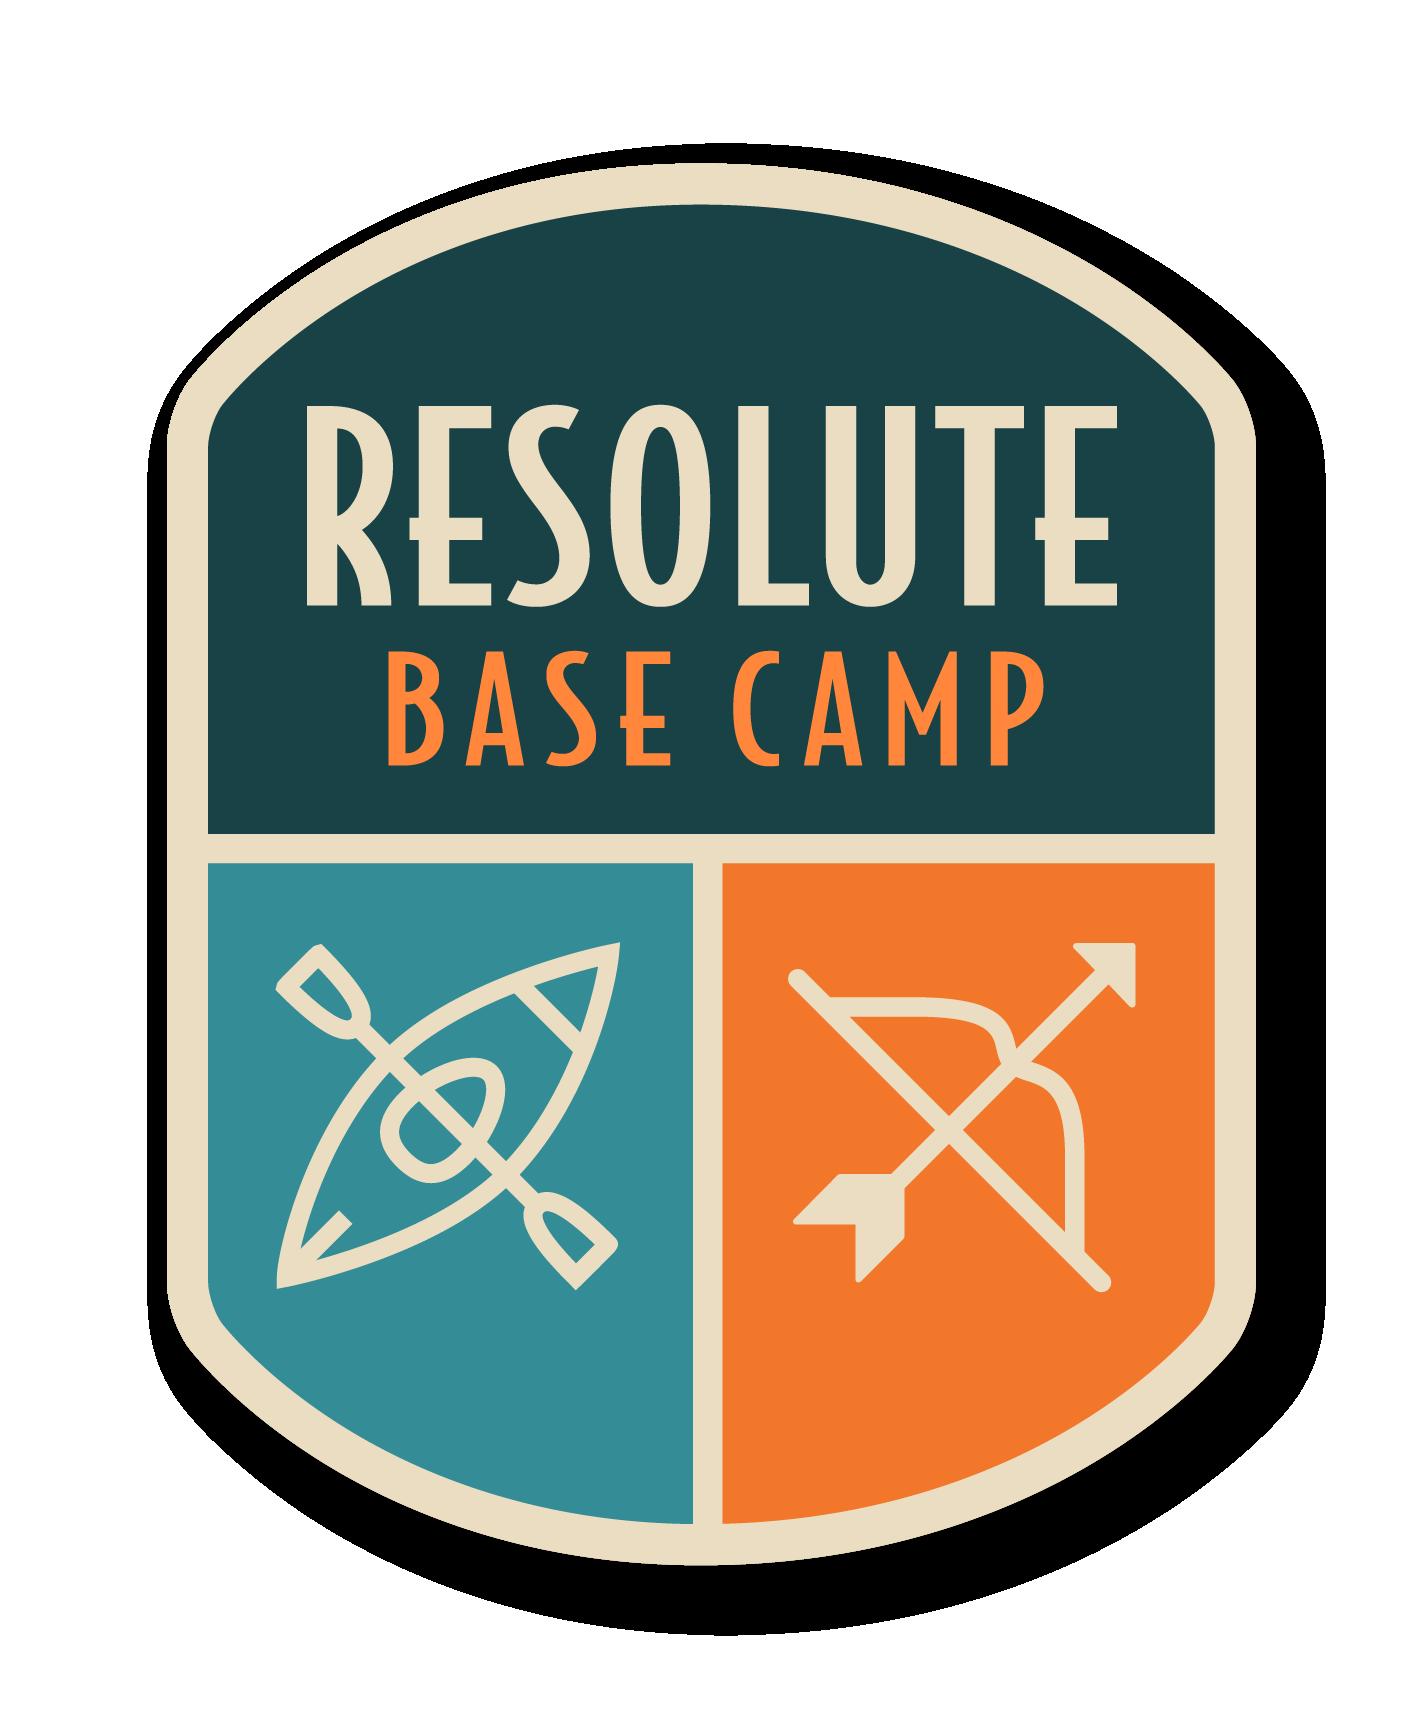 Resolute Base Camp